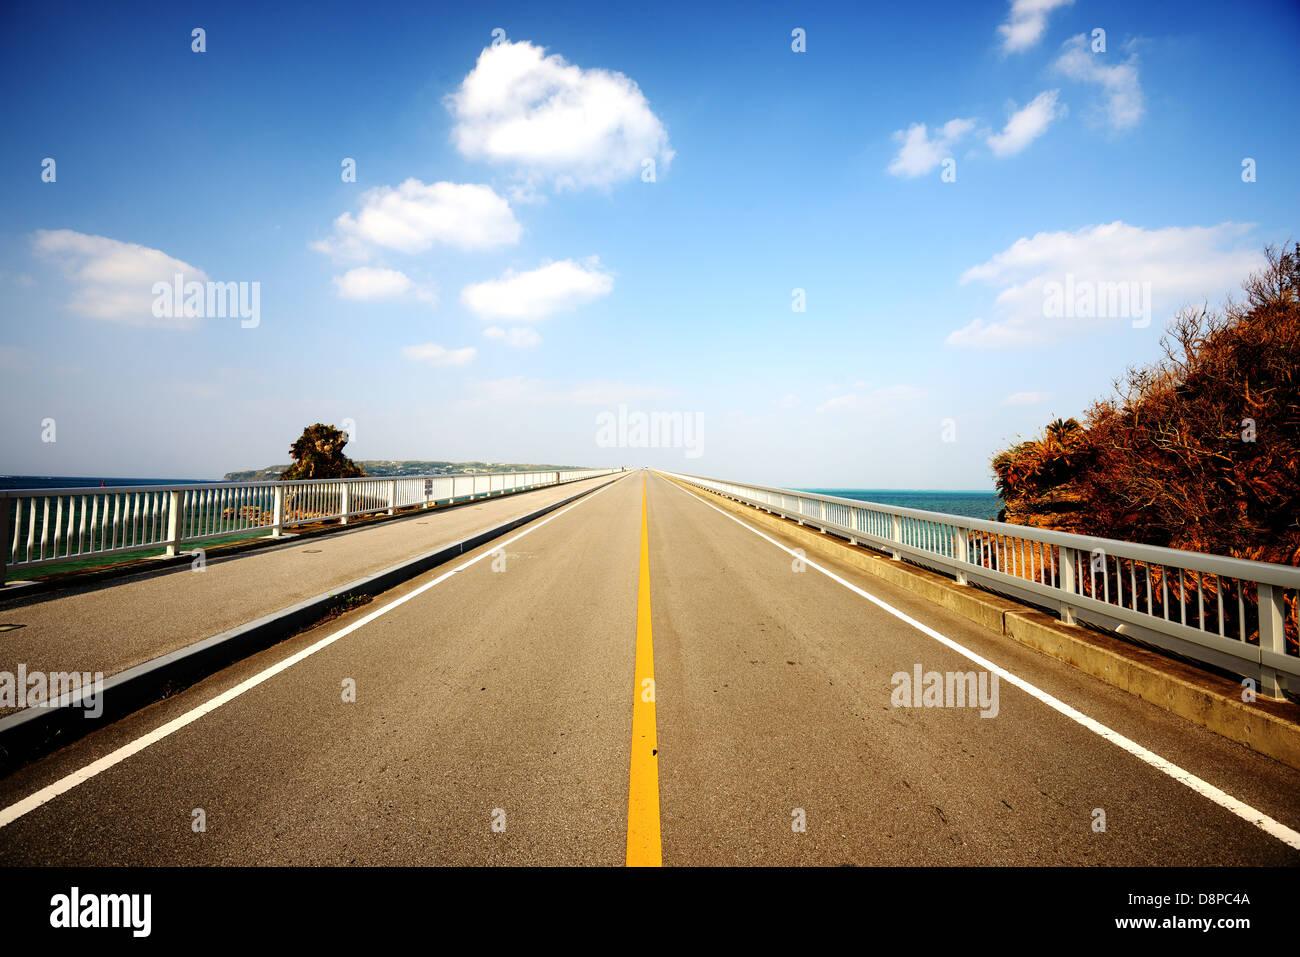 Kouri Bridge in Okinawa, Japan. - Stock Image